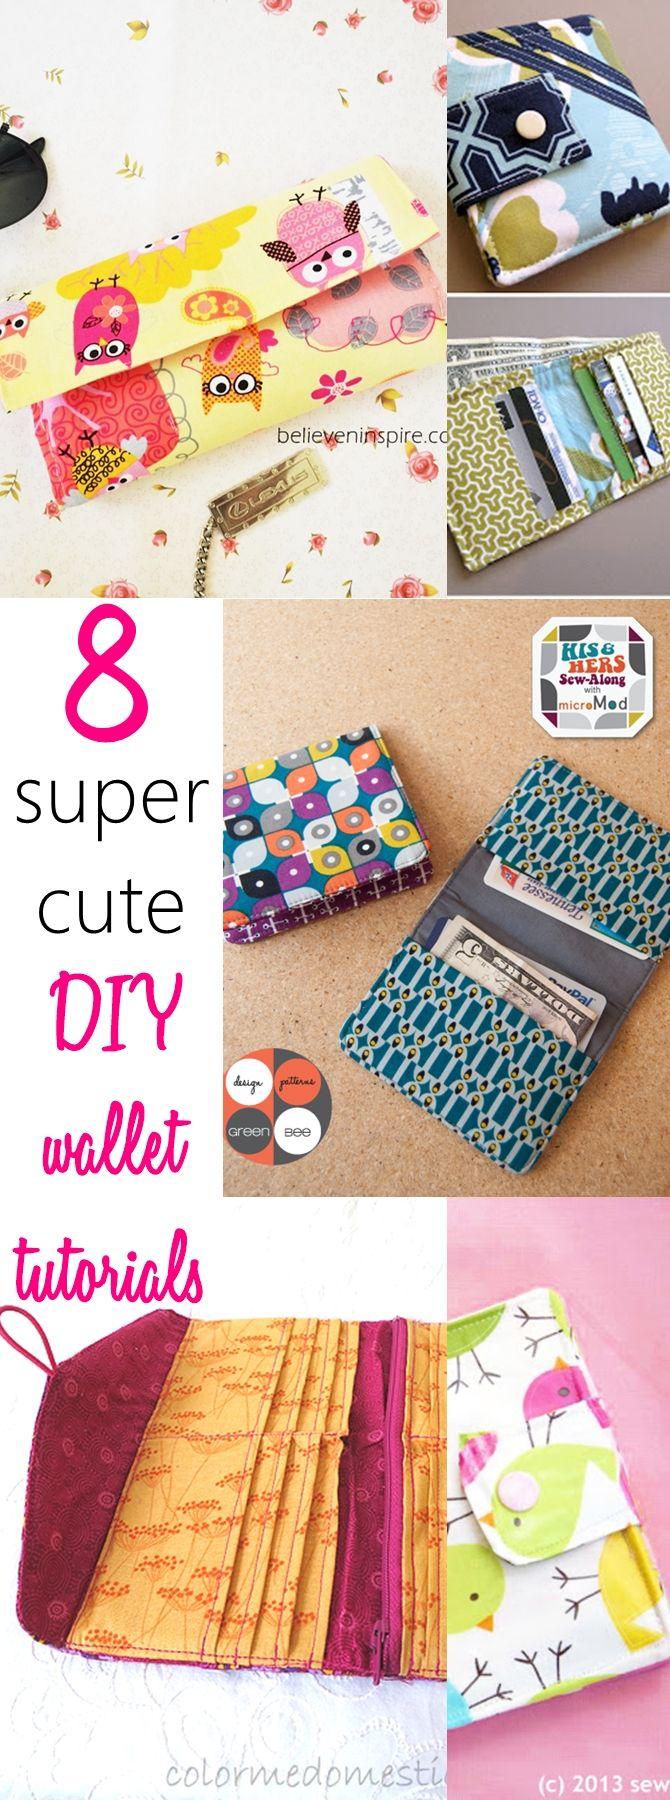 8 Super Cute DIY Wallet Tutorials | Pinterest | Diy wallet tutorial ...